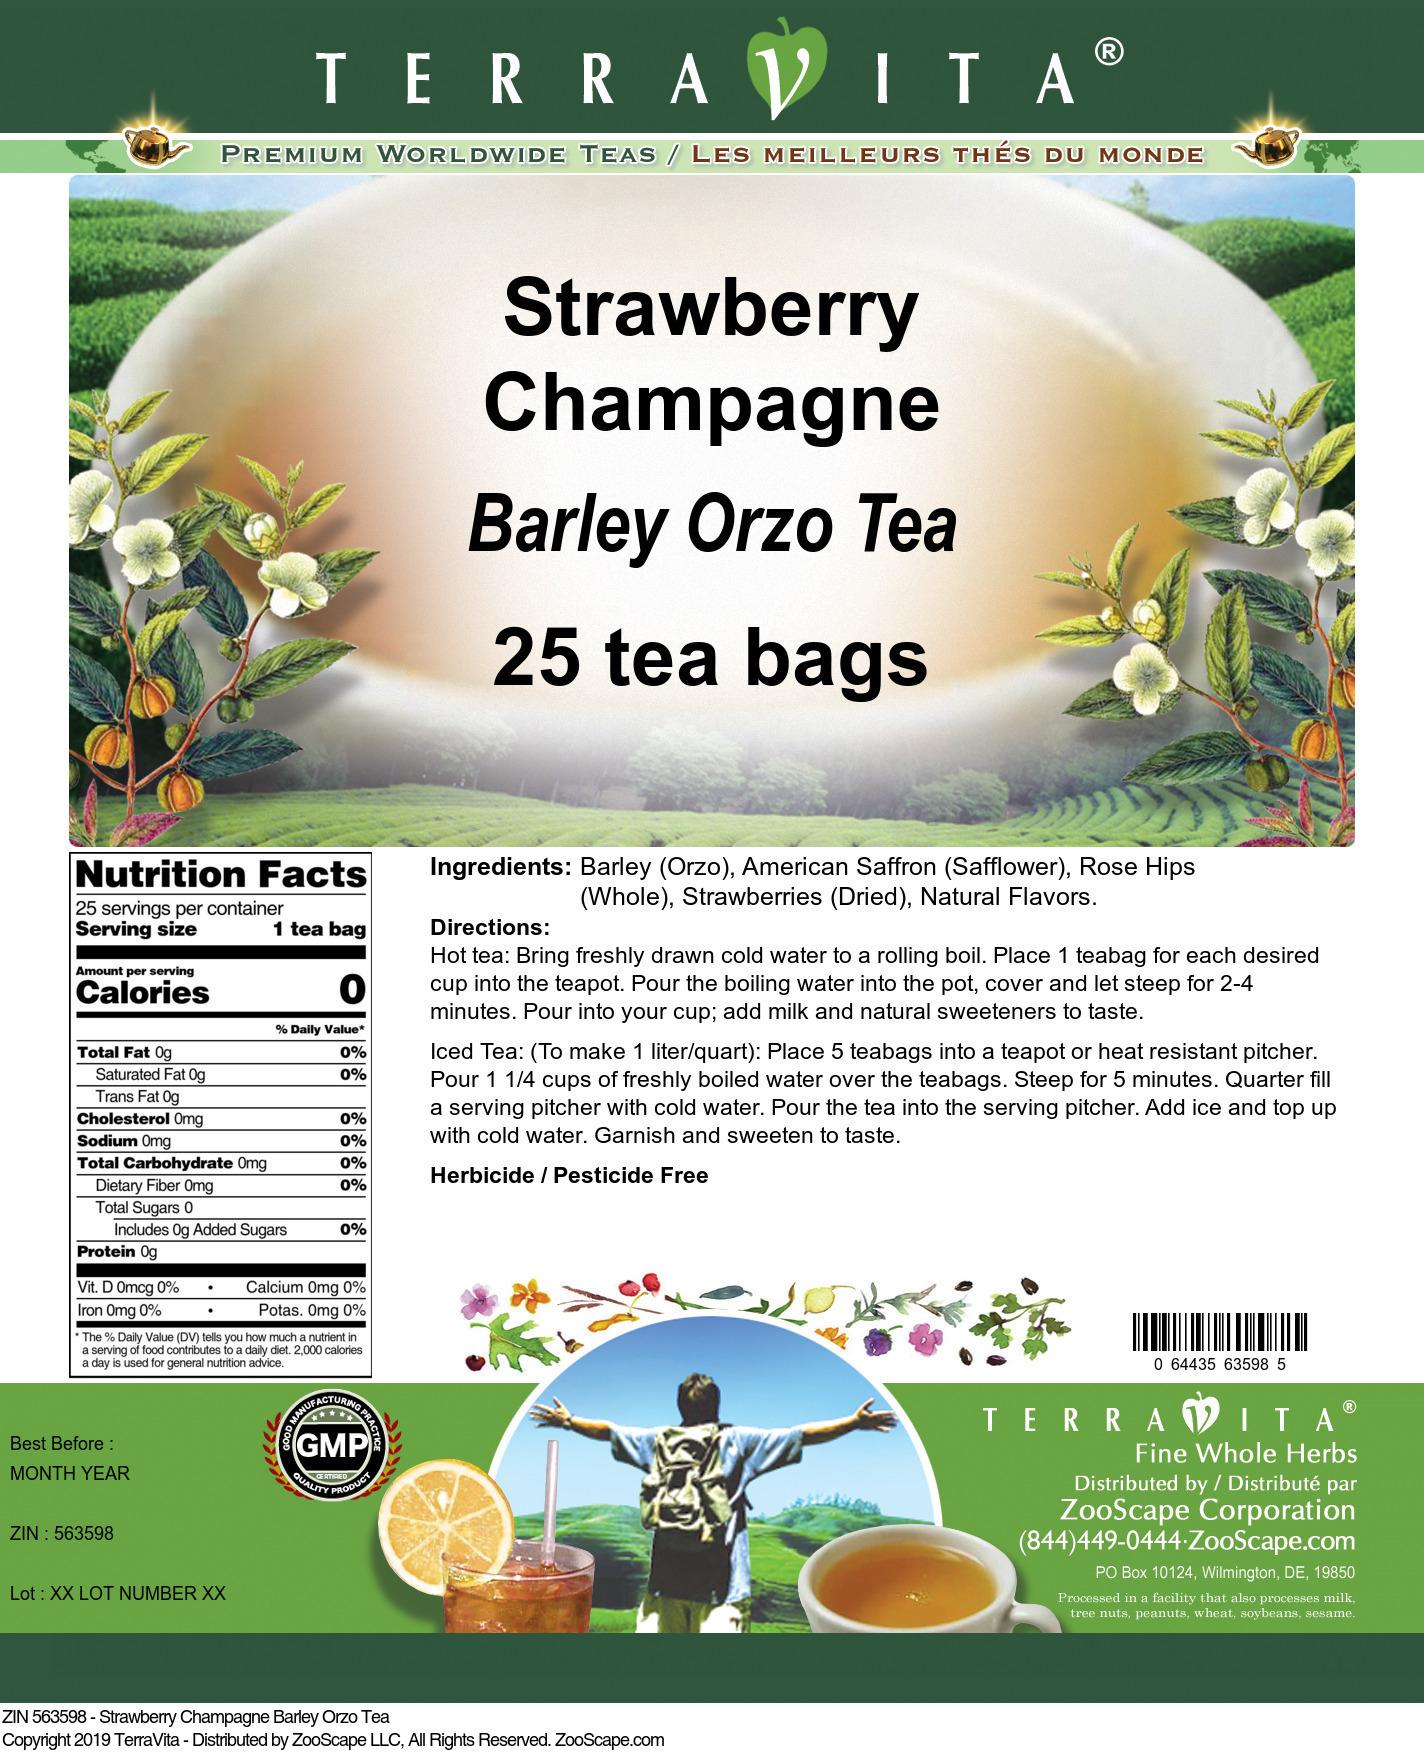 Strawberry Champagne Barley Orzo Tea